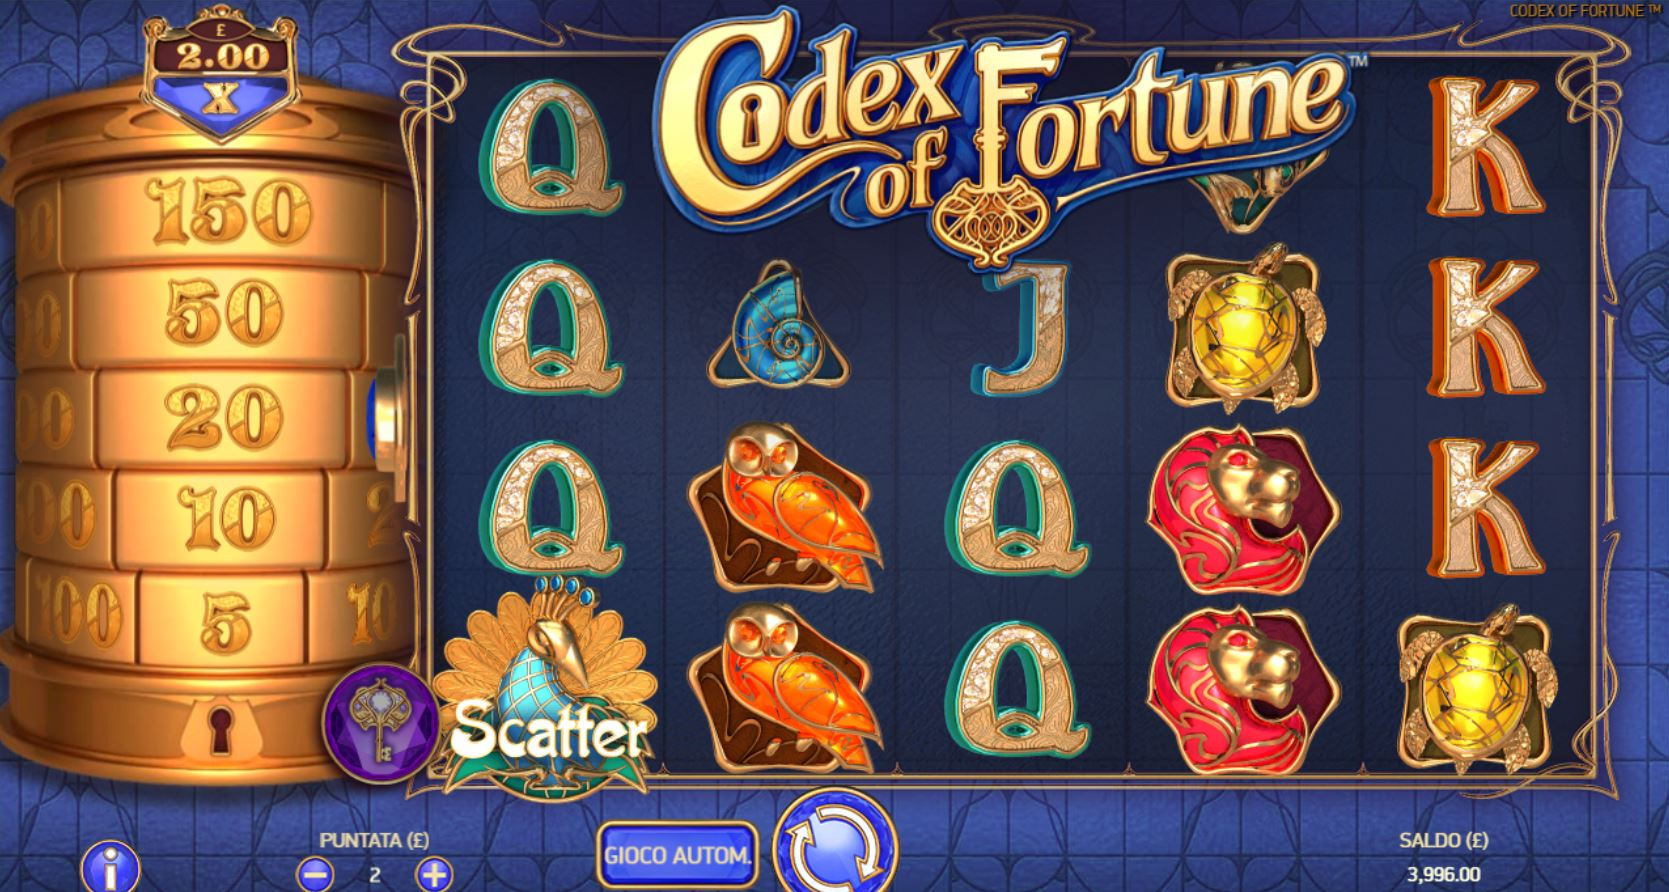 codex of fortune slot